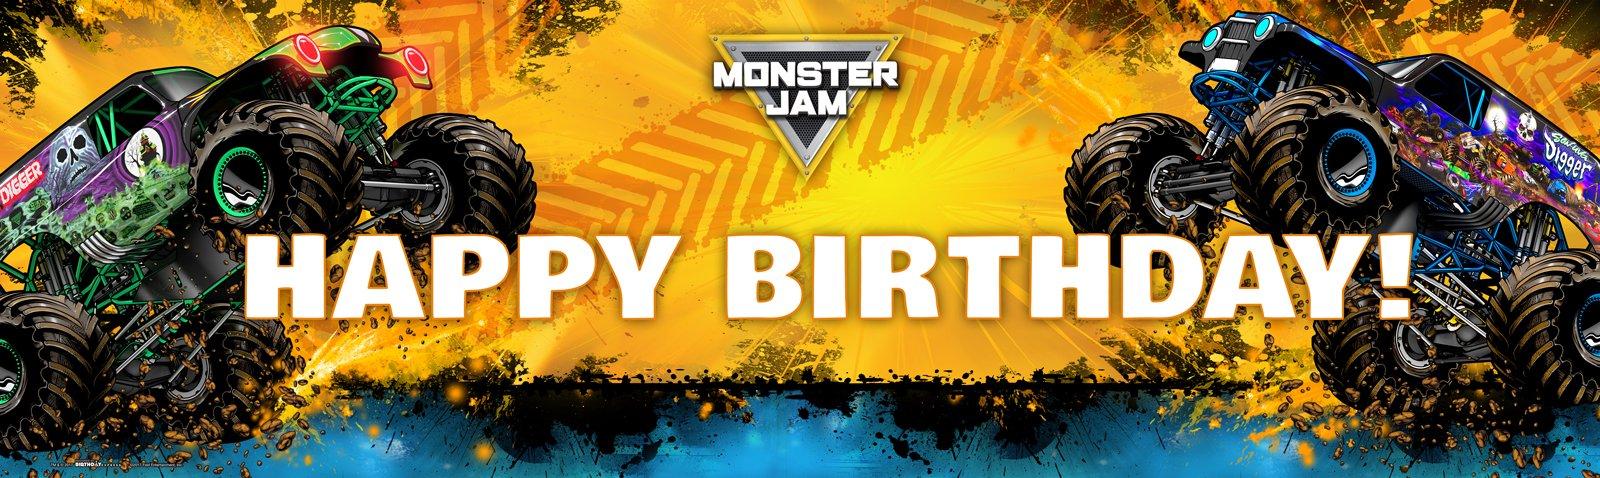 Monster Jam - Birthday Party Supplies - Vinyl Birthday Banner 18'' x 61'' by BirthdayExpress